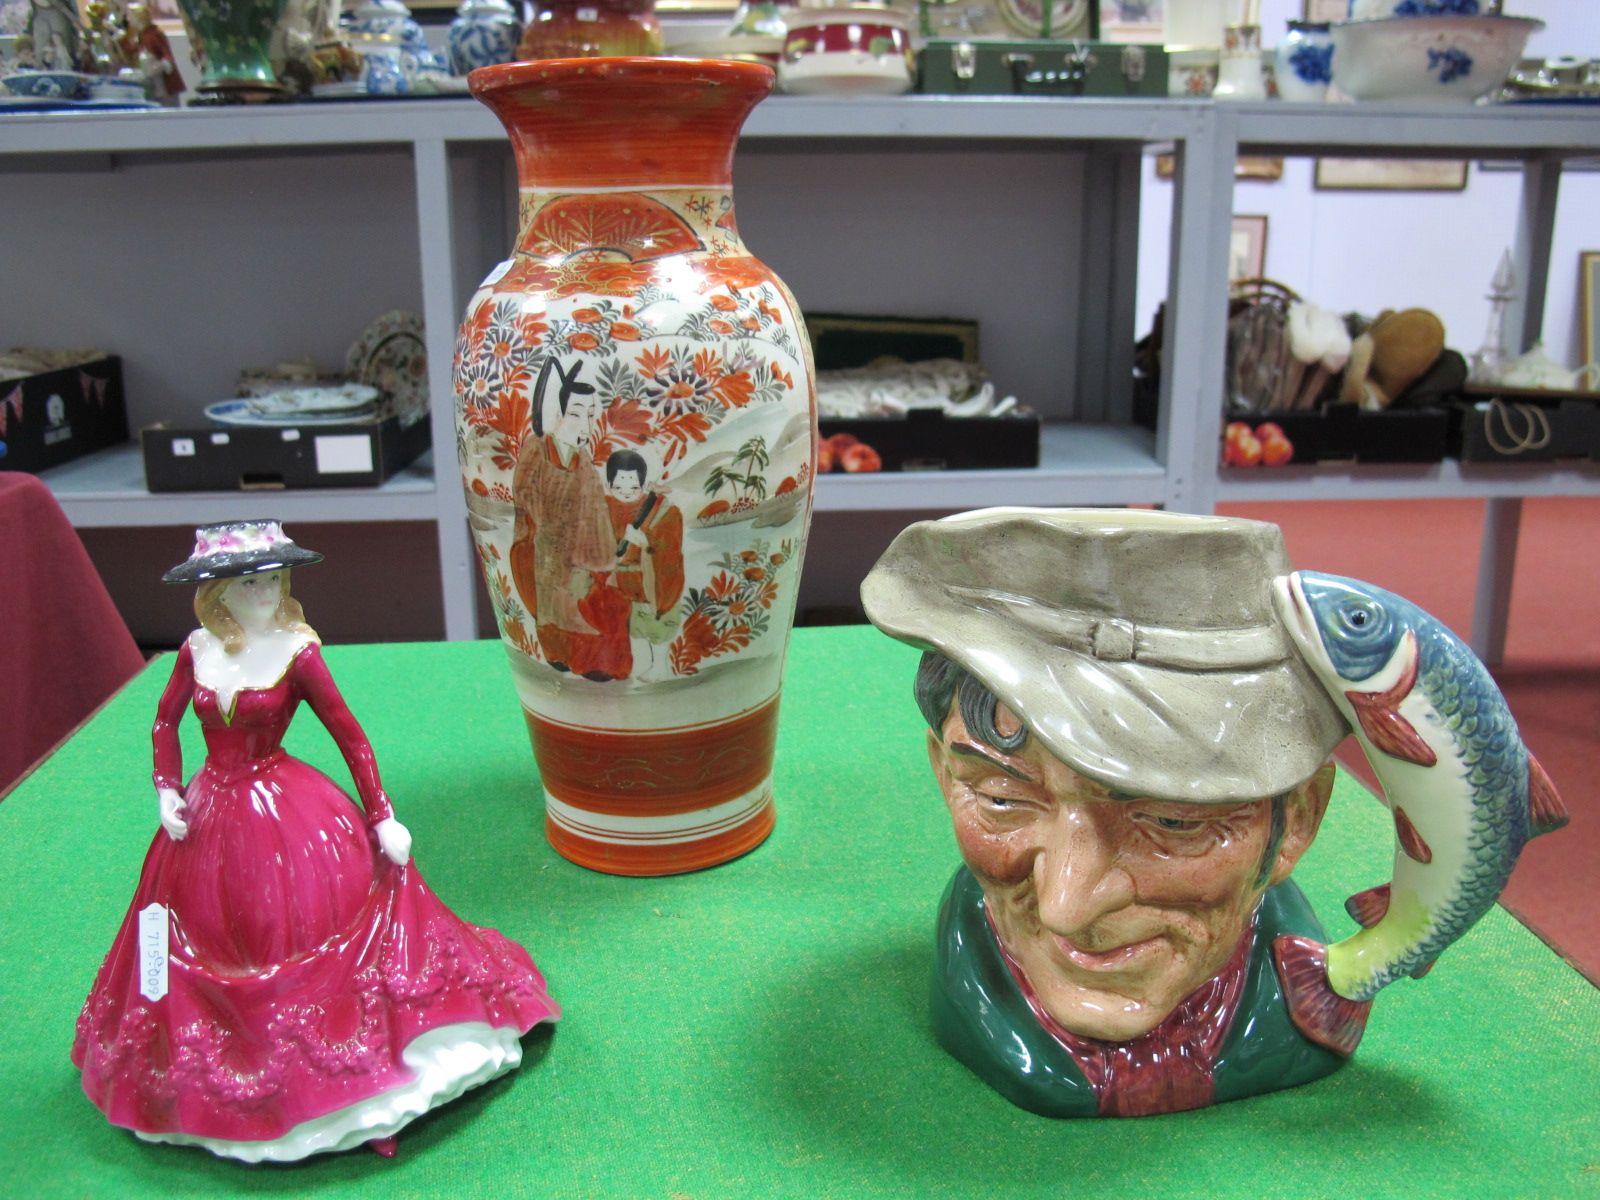 Lot 48 - A Worcester Figurine 'Christina' Les Petite's, Doulton 'The Poacher' character jug, Kutani style